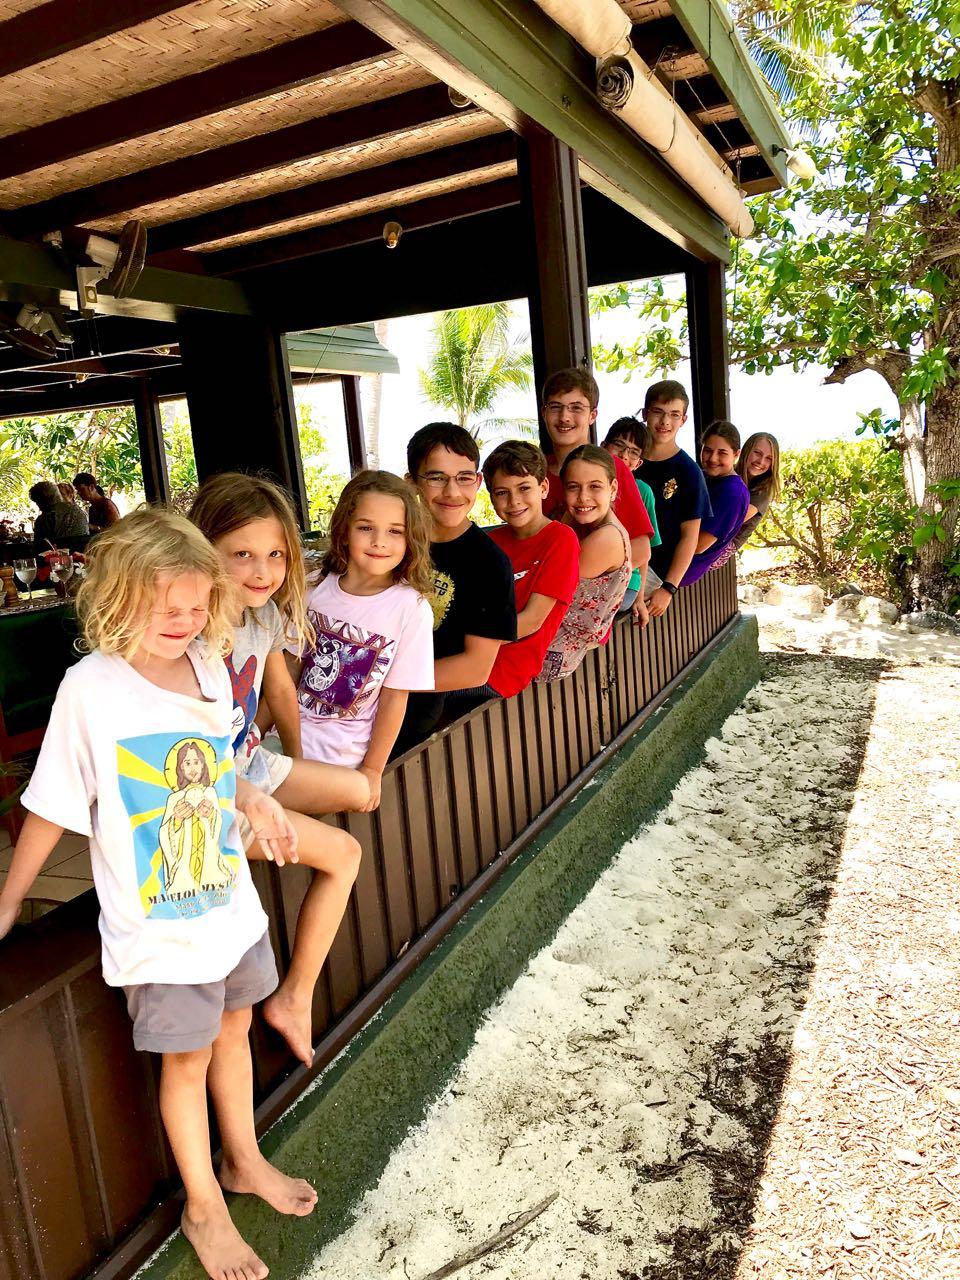 All the island kids!